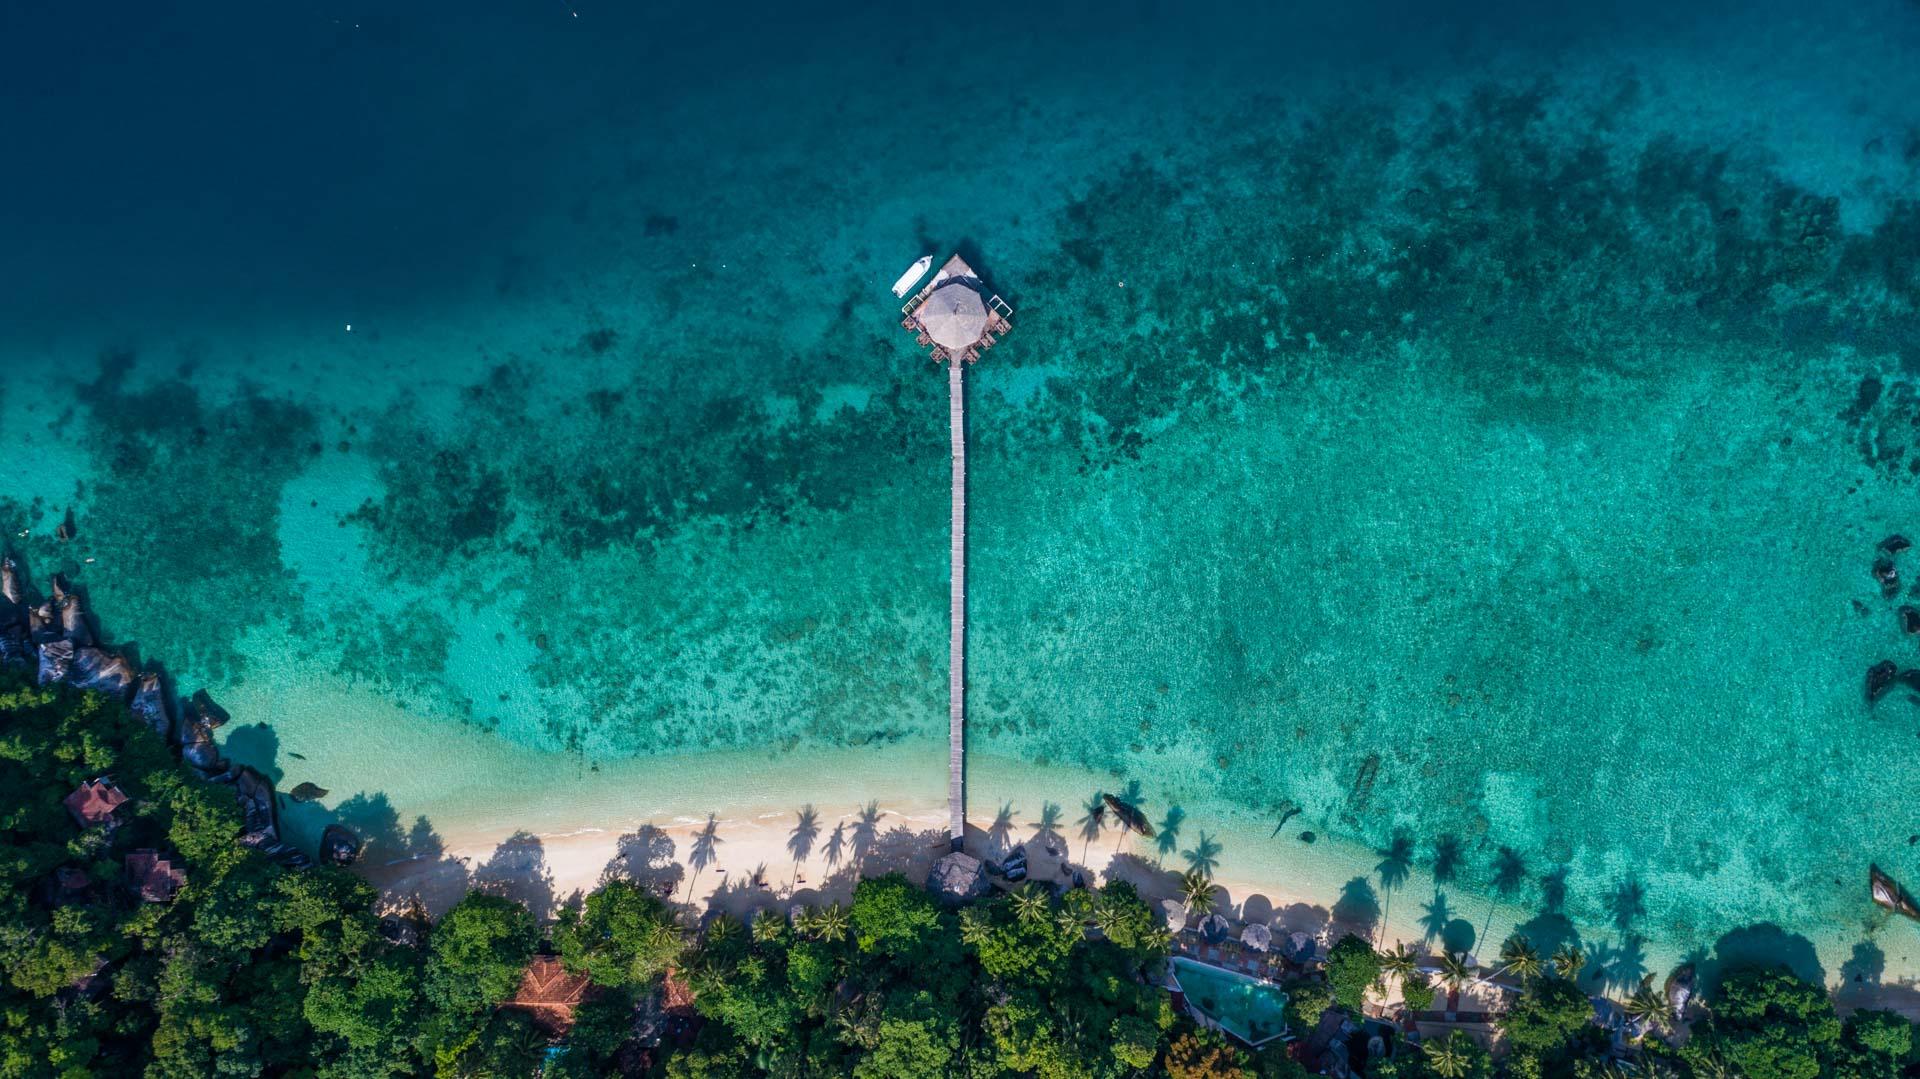 Tioman Island Malaysia Pescart Travel Photo Blog Enrico Pescantini aerial view drone 3